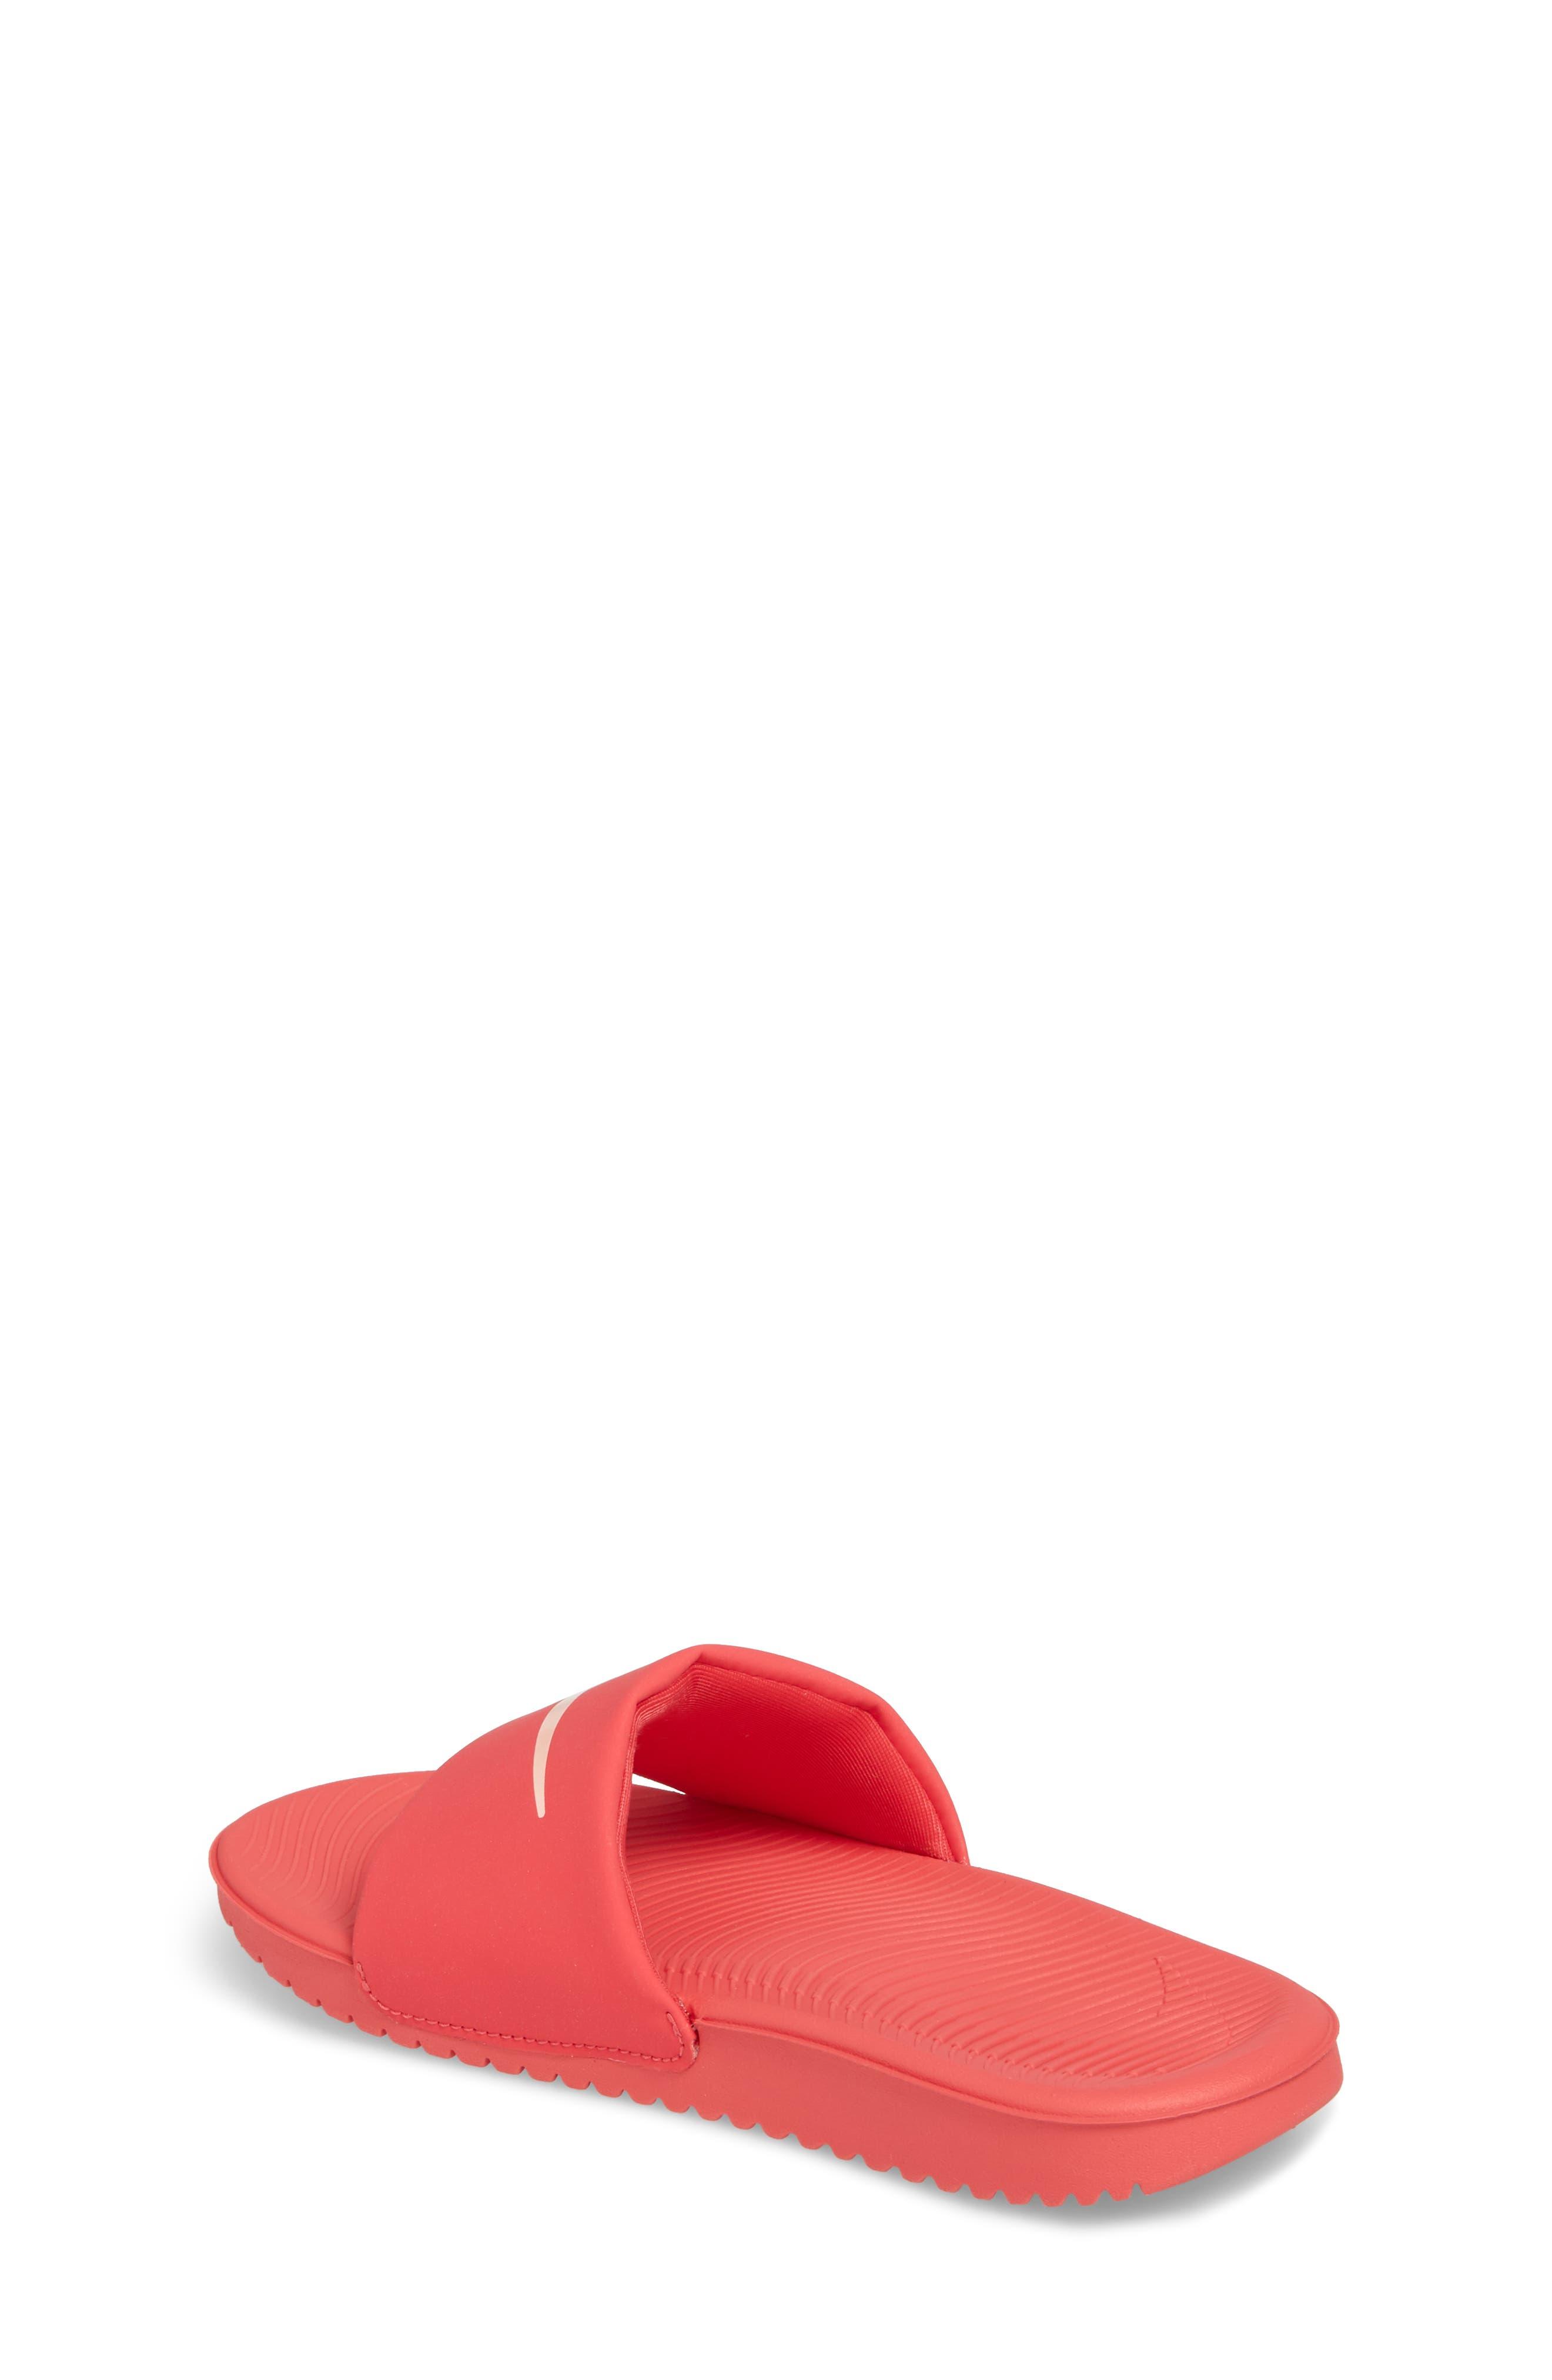 'Kawa' Slide Sandal,                             Alternate thumbnail 2, color,                             Tropical Pink/ Bleached Coral